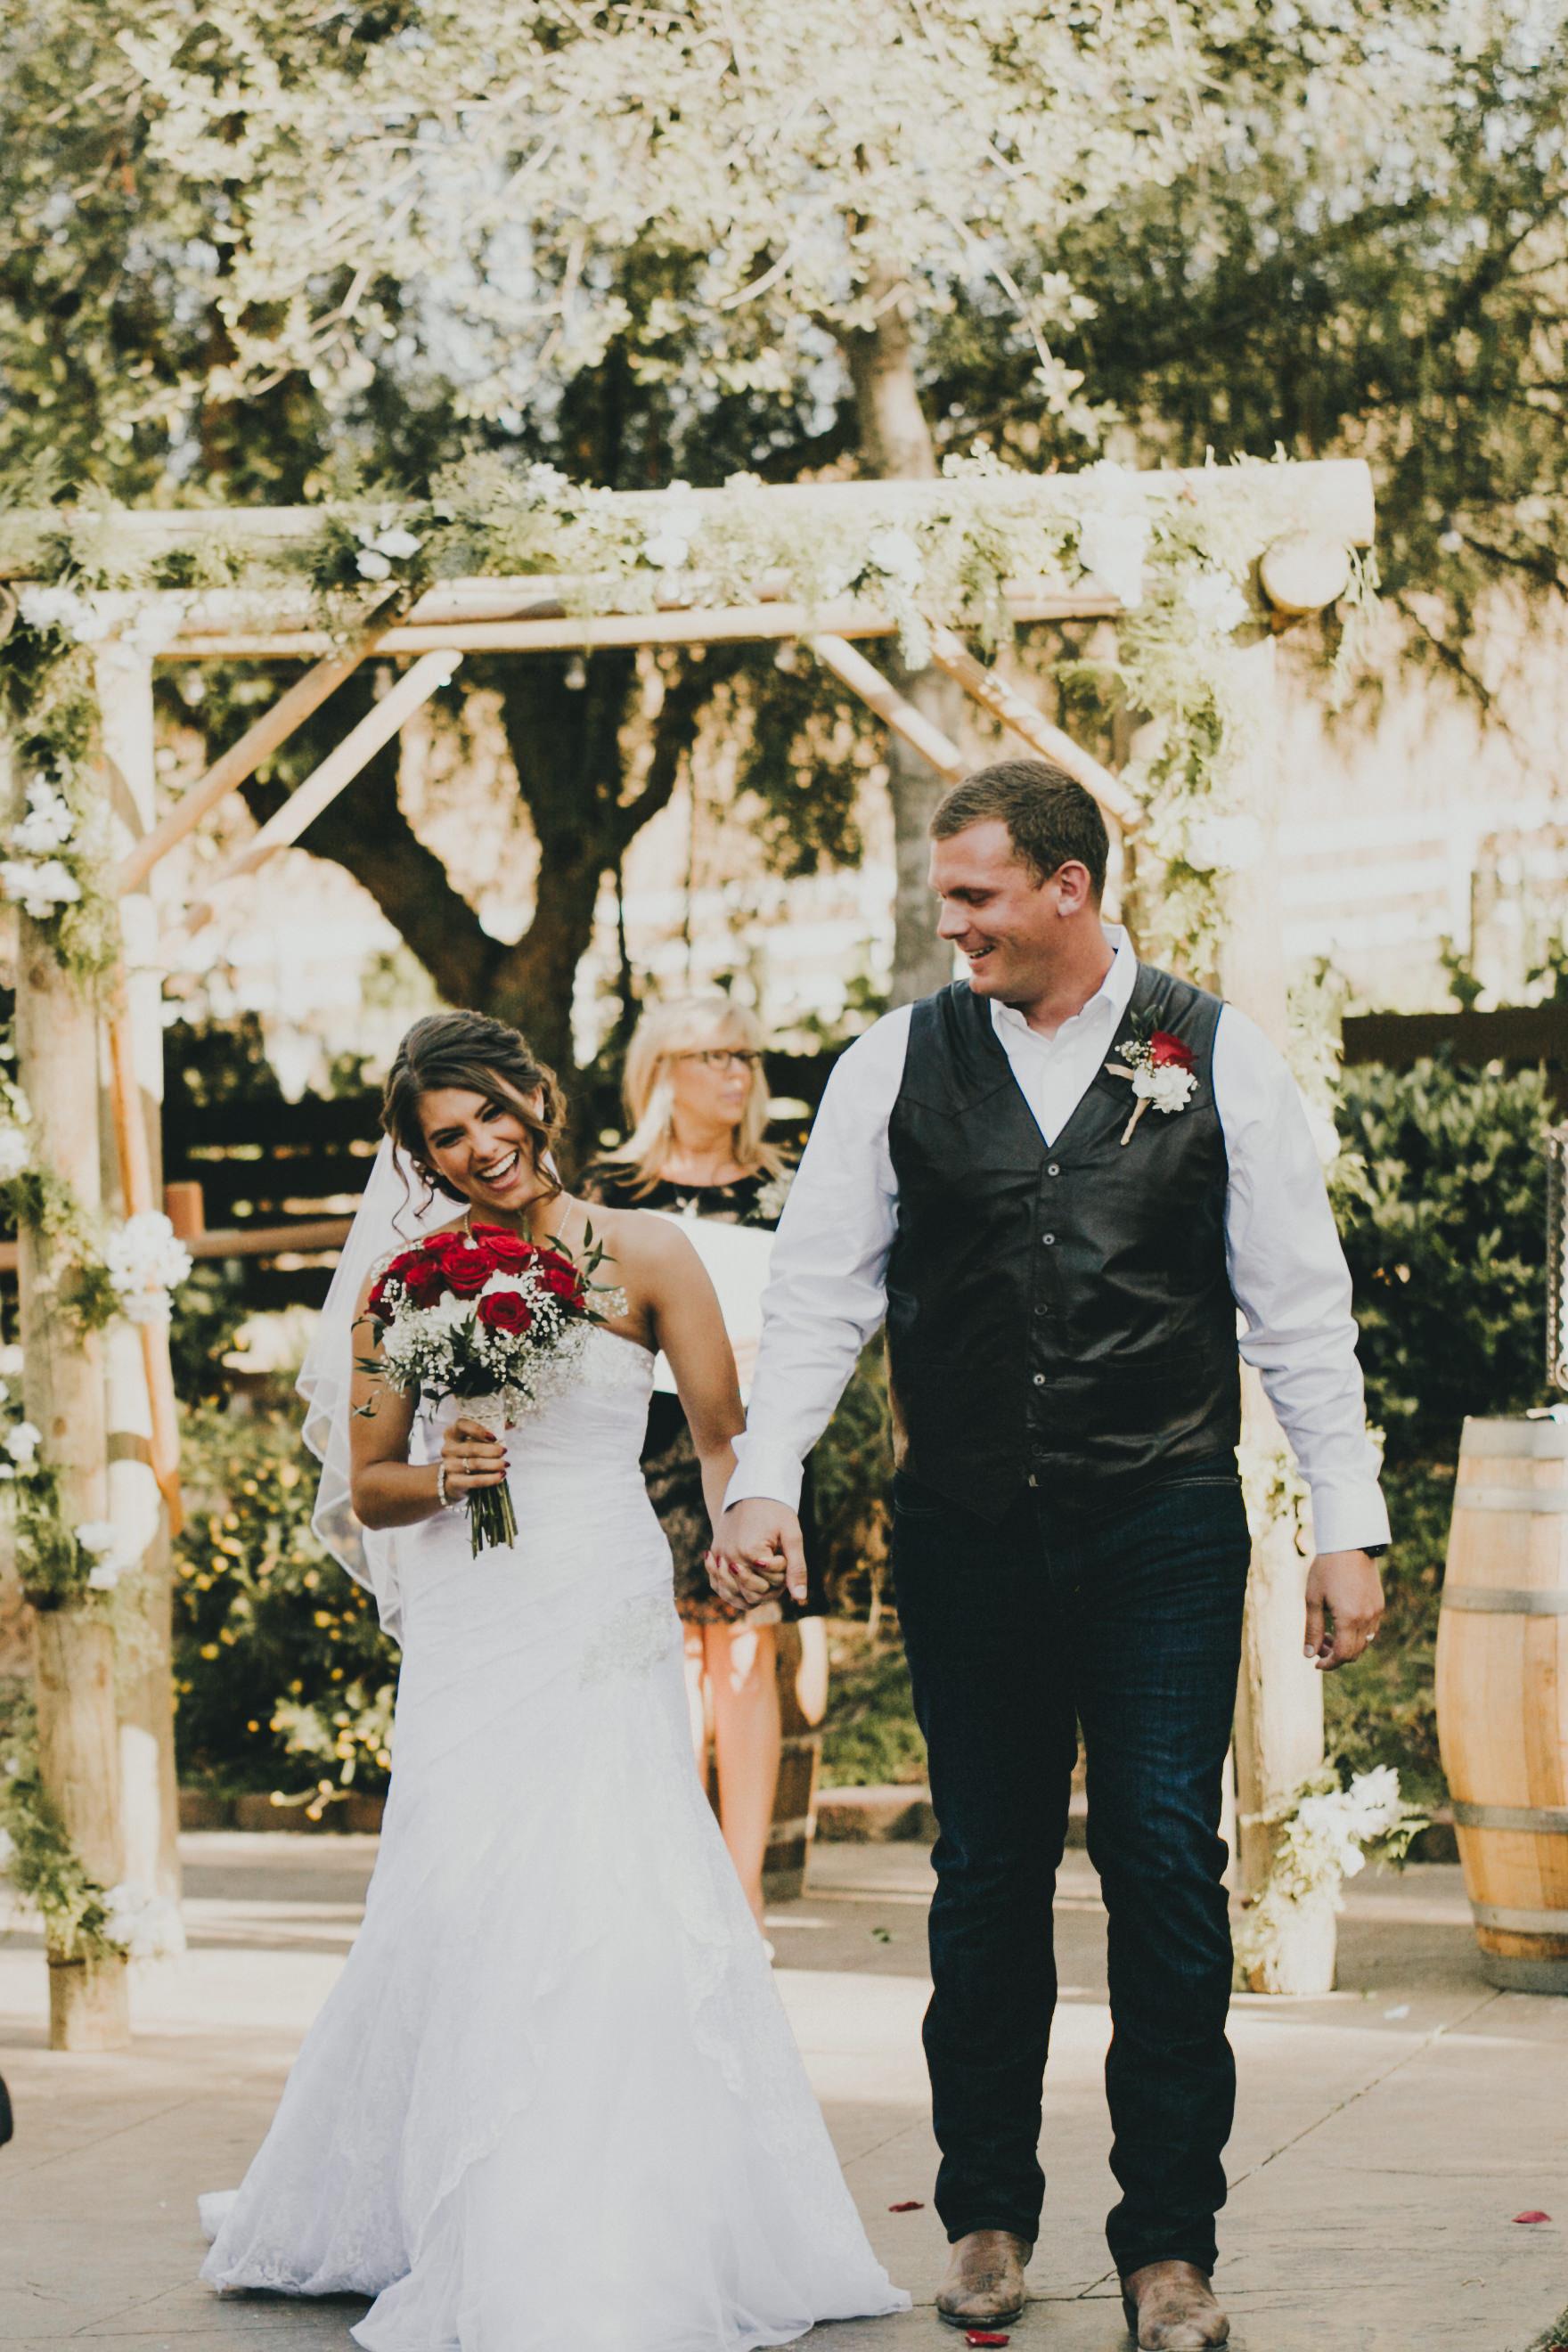 Cheyenne + Jordan - Wedding, Natalie Griffo (58 of 157).jpg